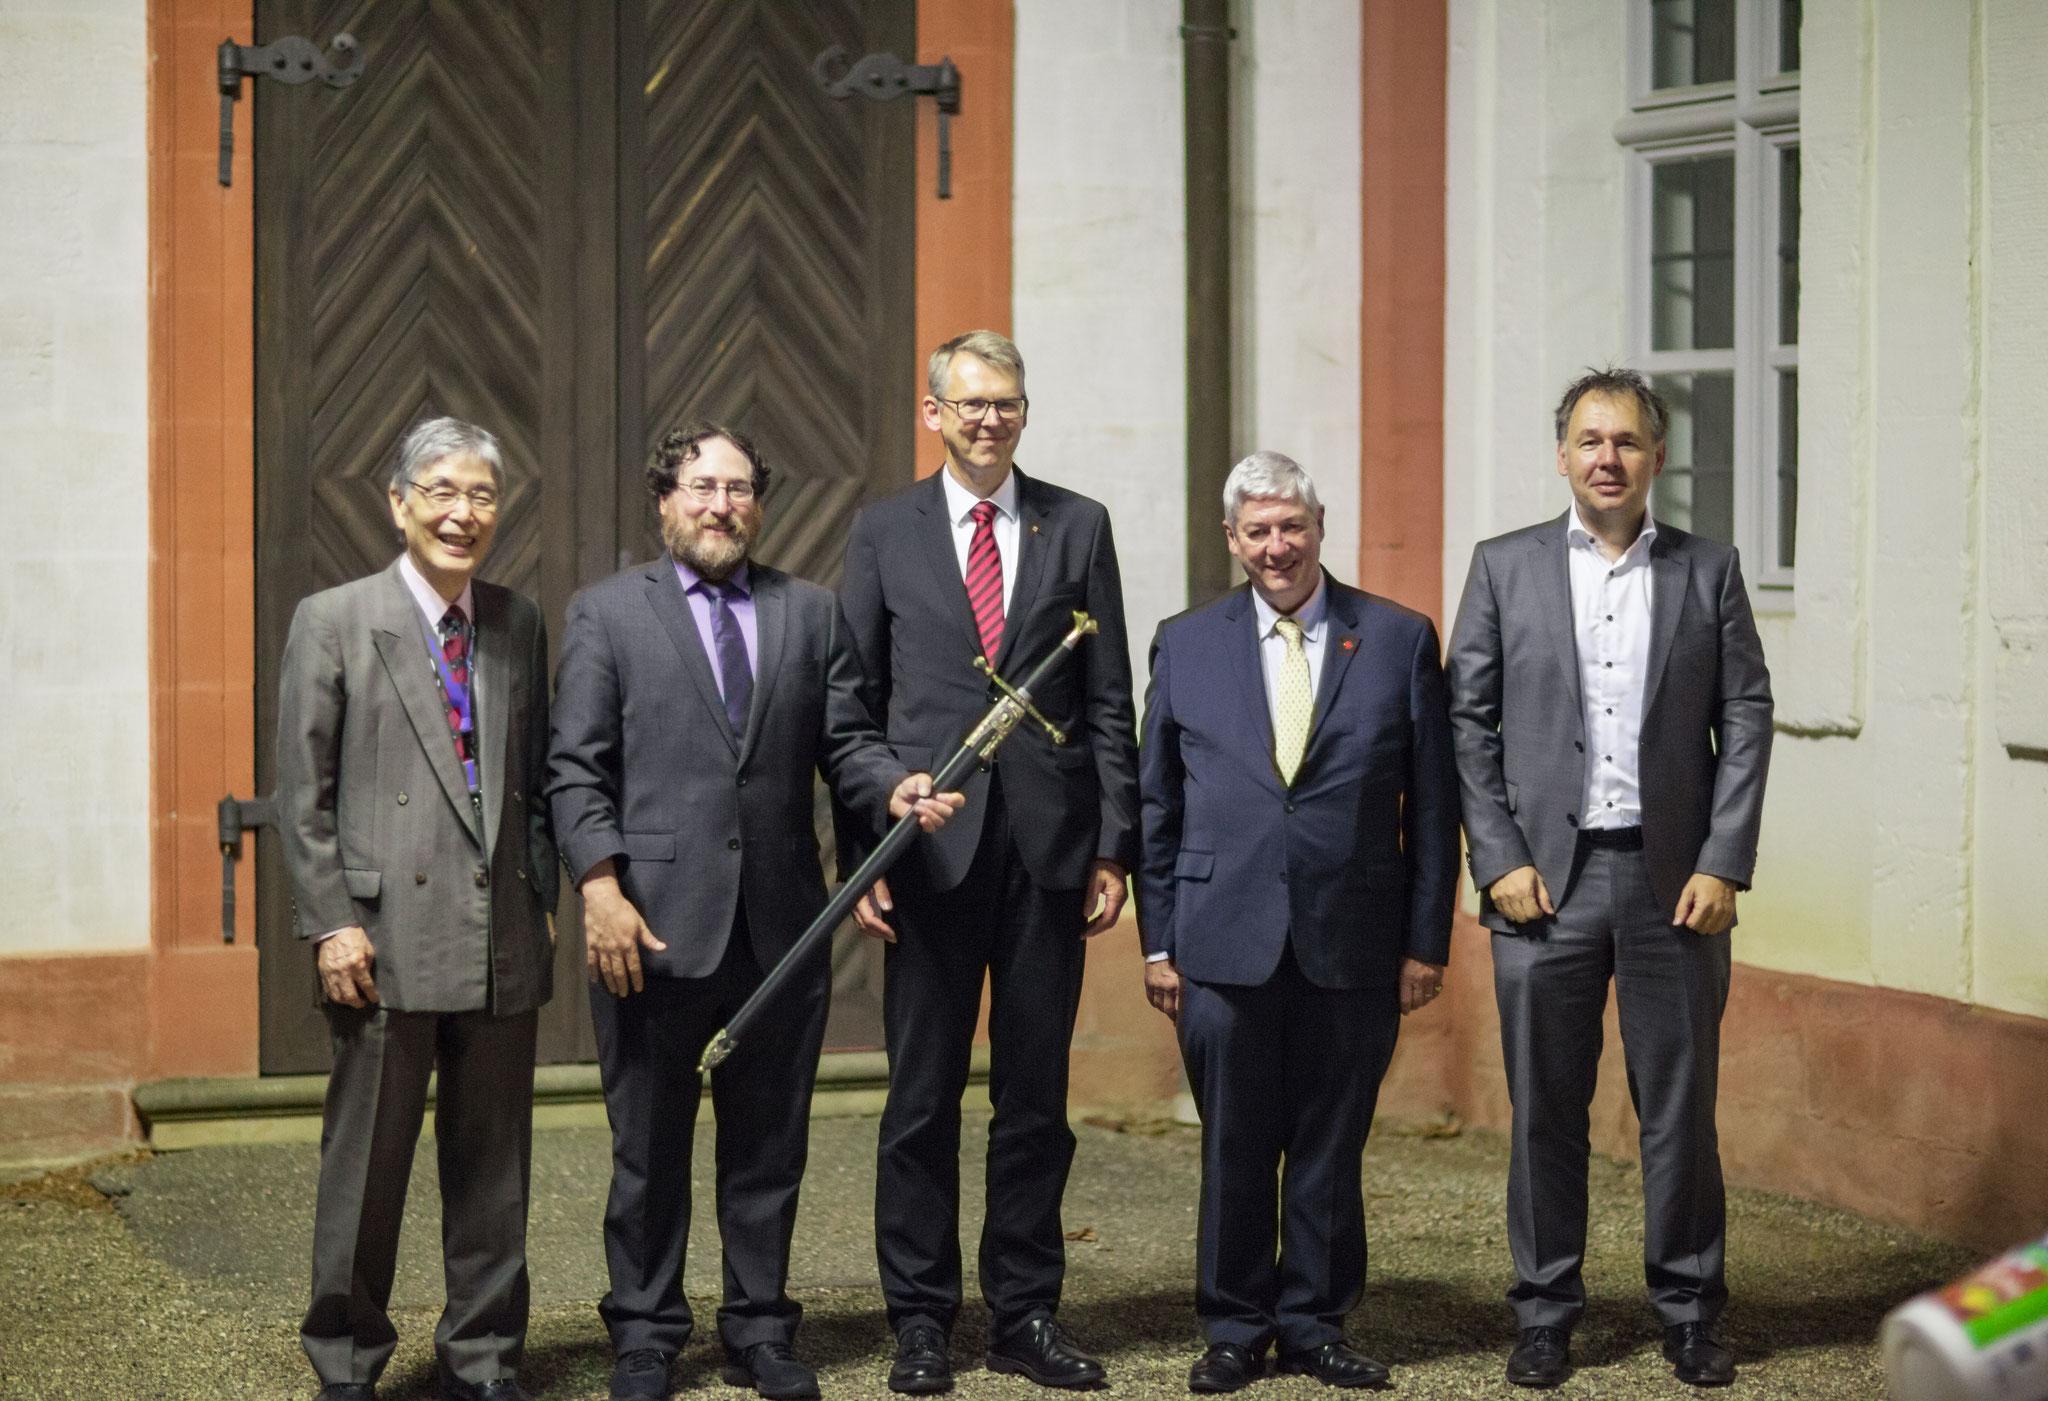 Prof. Isamu Miyamoto, Prof. Craig B. Arnold, Prof. Frank Vollertsen, Prof. Jean-Pierre Kruth and Prof. Michael Schmidt during LANE 2018 (from left to right)